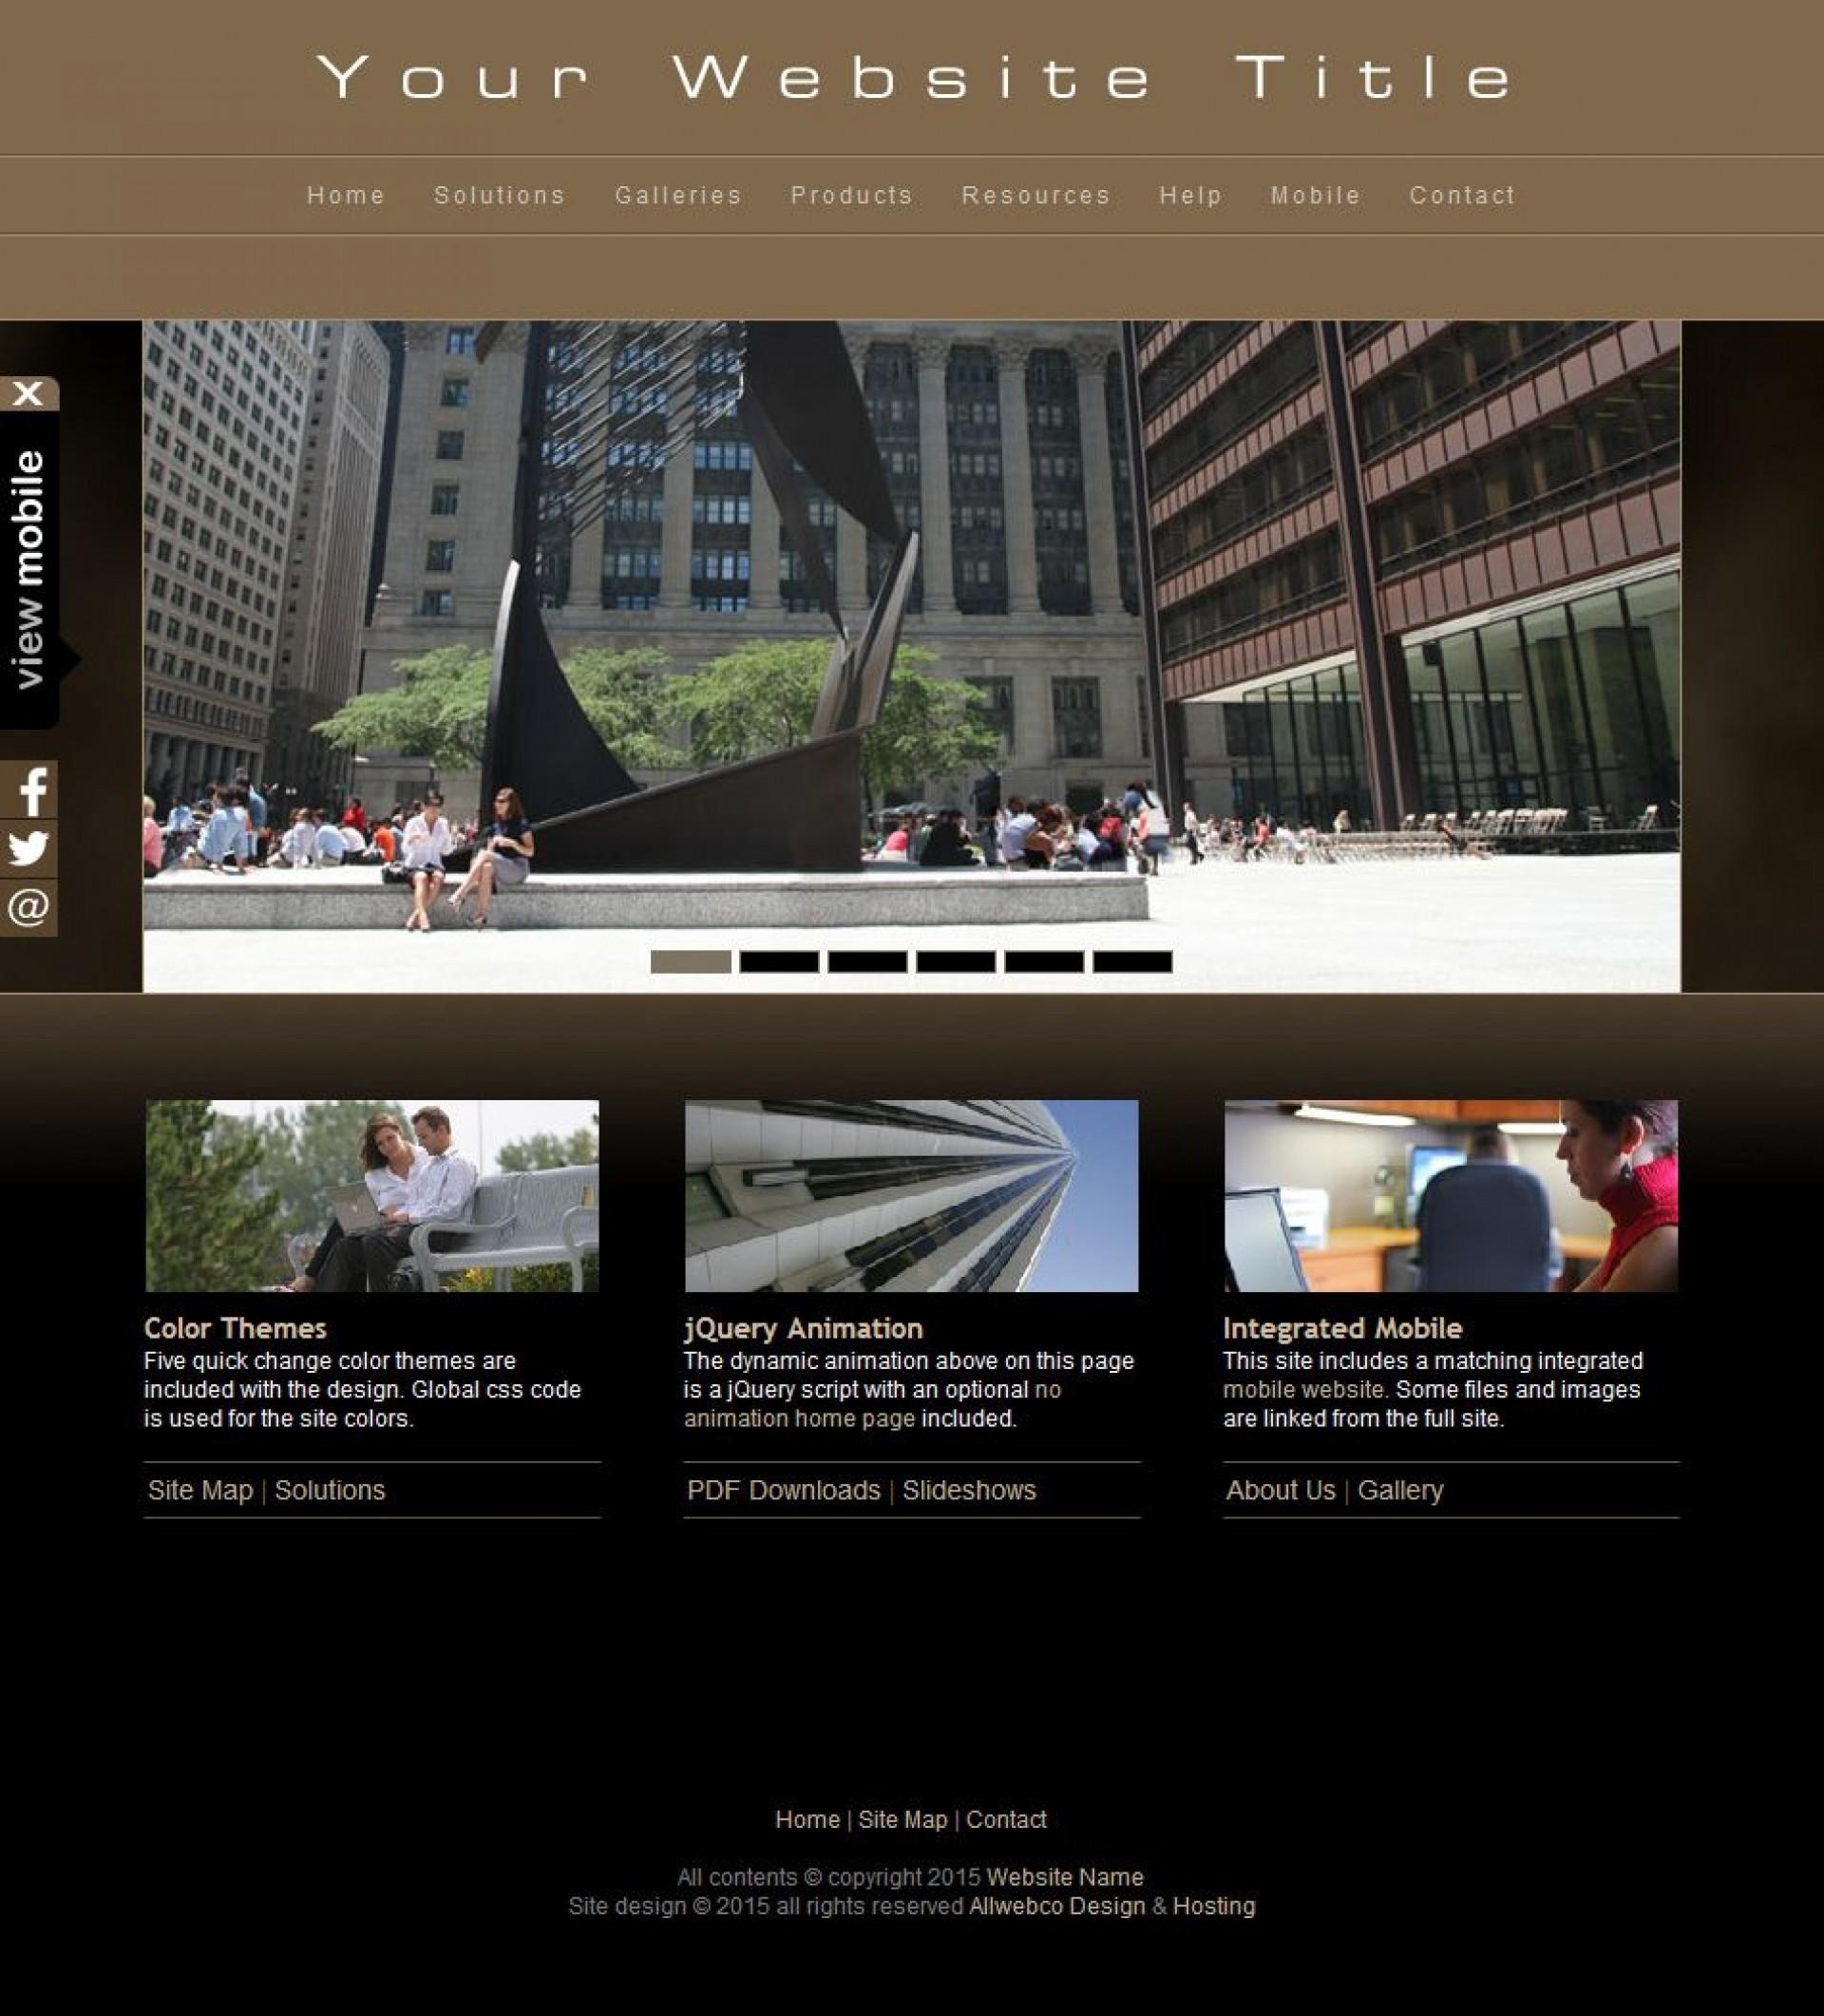 009 Amazing Website Design Site Map Template 1920